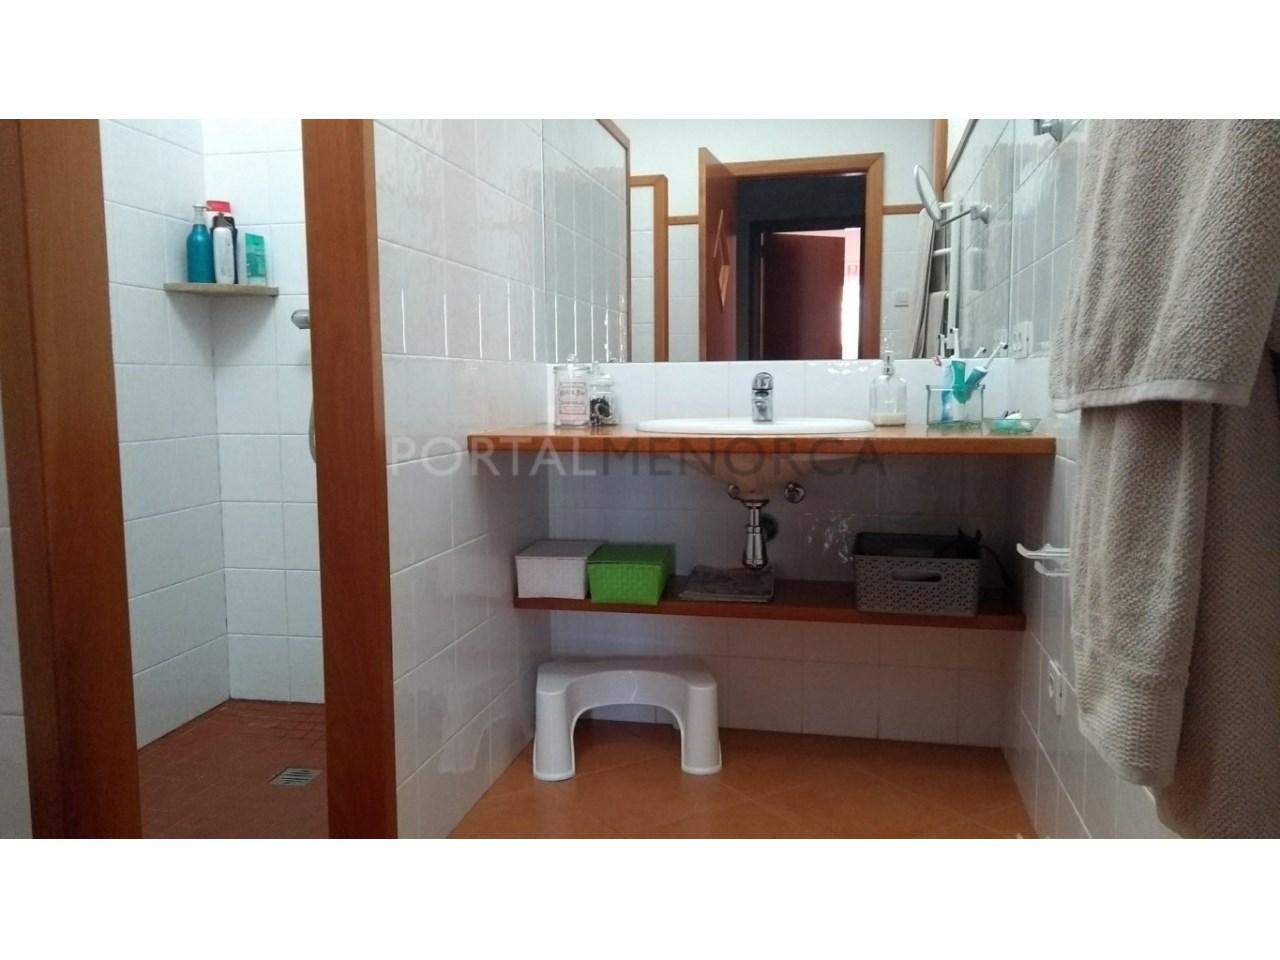 House with patio for sale in Ciutadella-Bathroom Suite